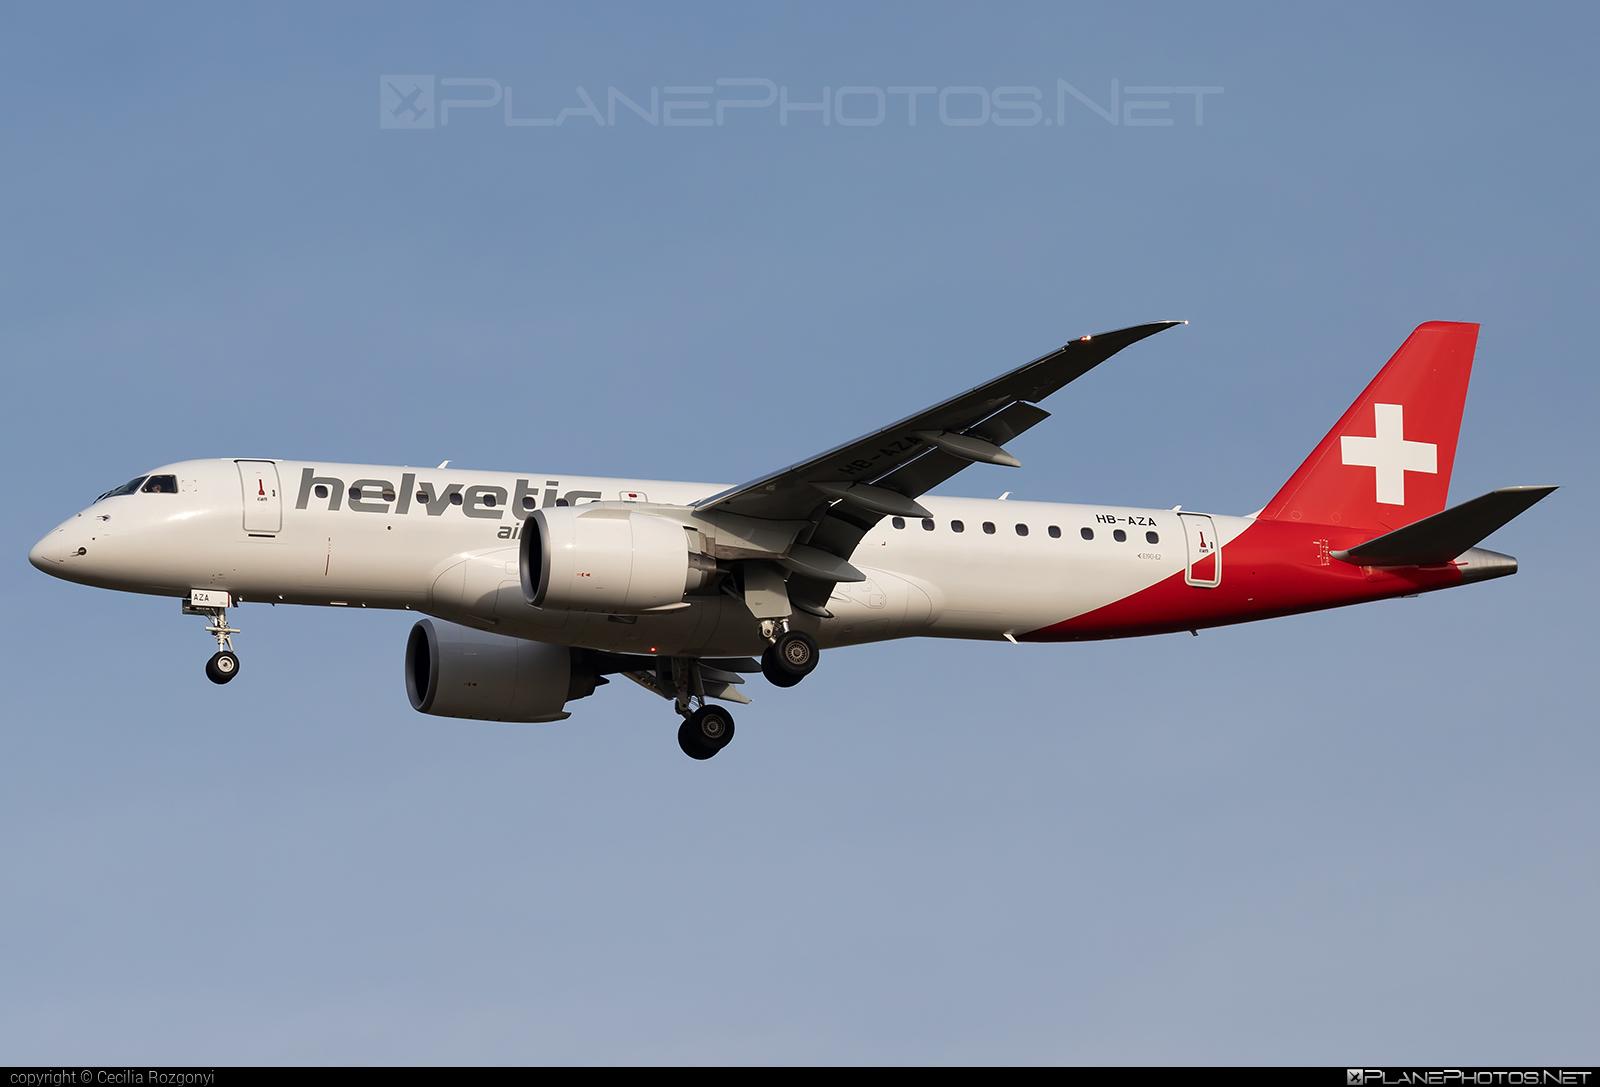 Embraer E190-E2 (ERJ-190-300STD) - HB-AZA operated by Helvetic Airways #e190 #e190e2 #embraer #embraer190 #embraer190300 #embraer190300std #embraer190e2 #erj190300 #erj190300std